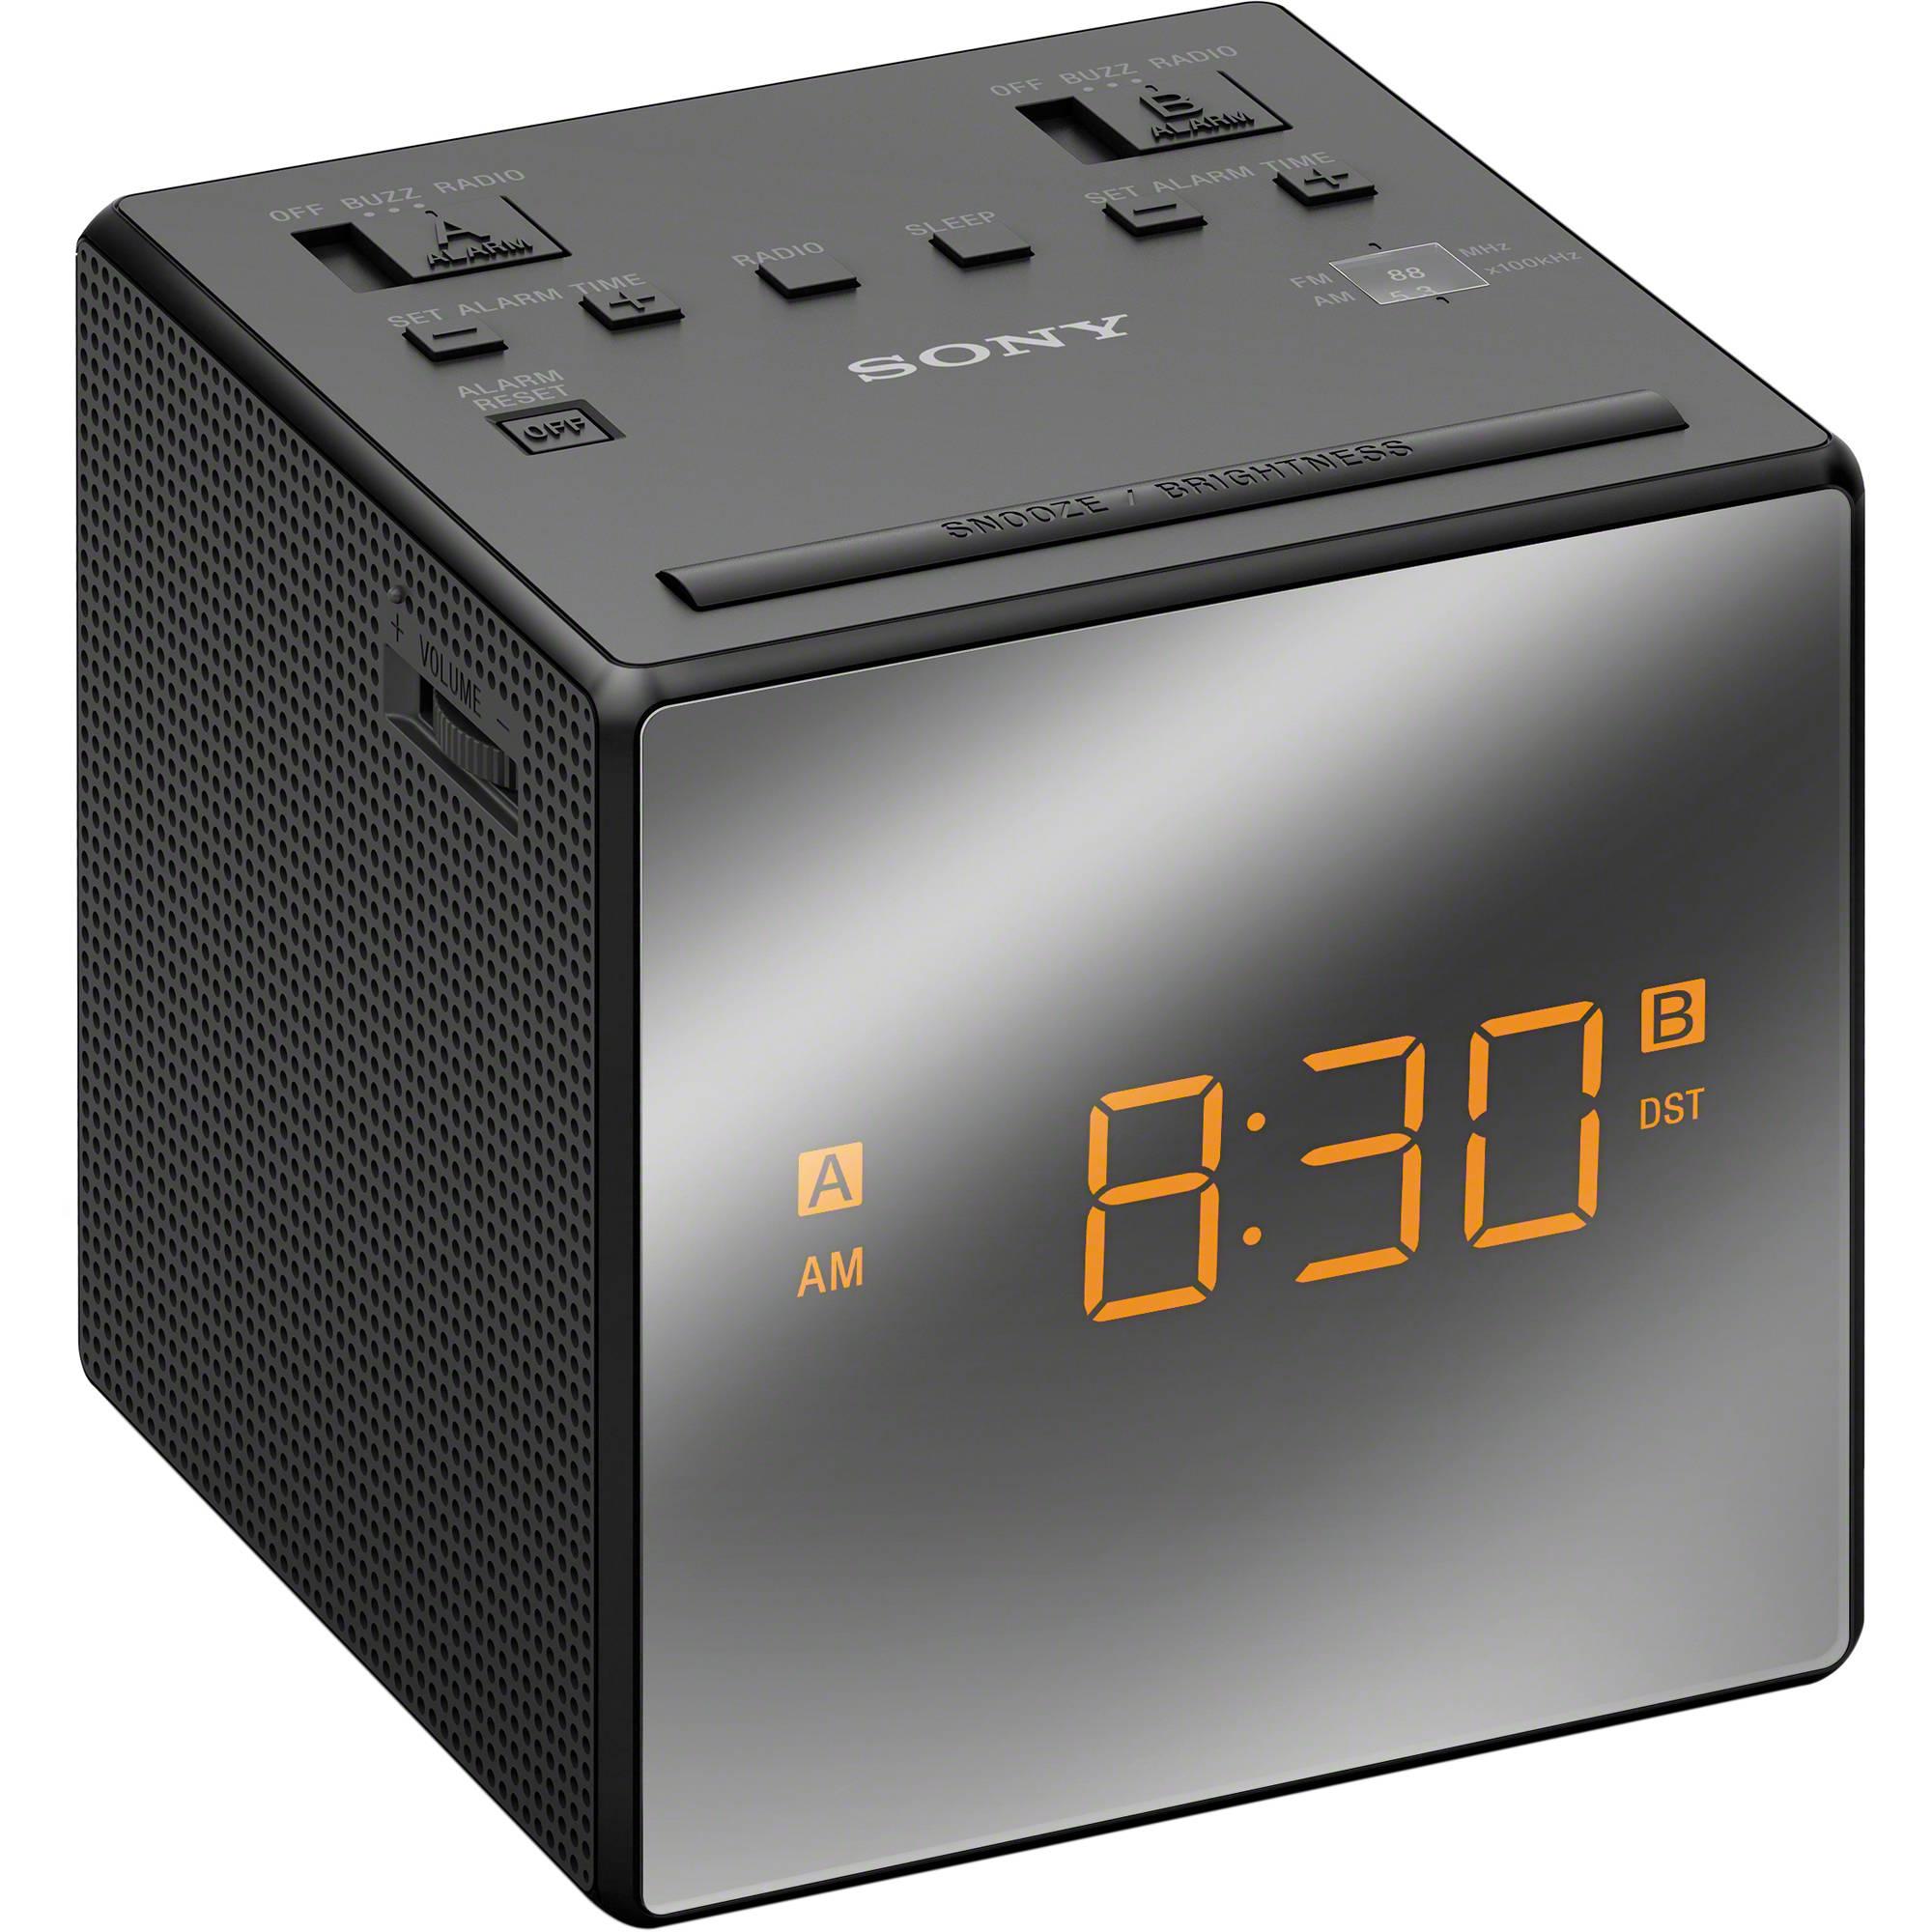 sony dual alarm clock radio black icfc1tblack b h photo video rh bhphotovideo com sony icfc1pj alarm clock radio user manual sony clock radio manual icf c218